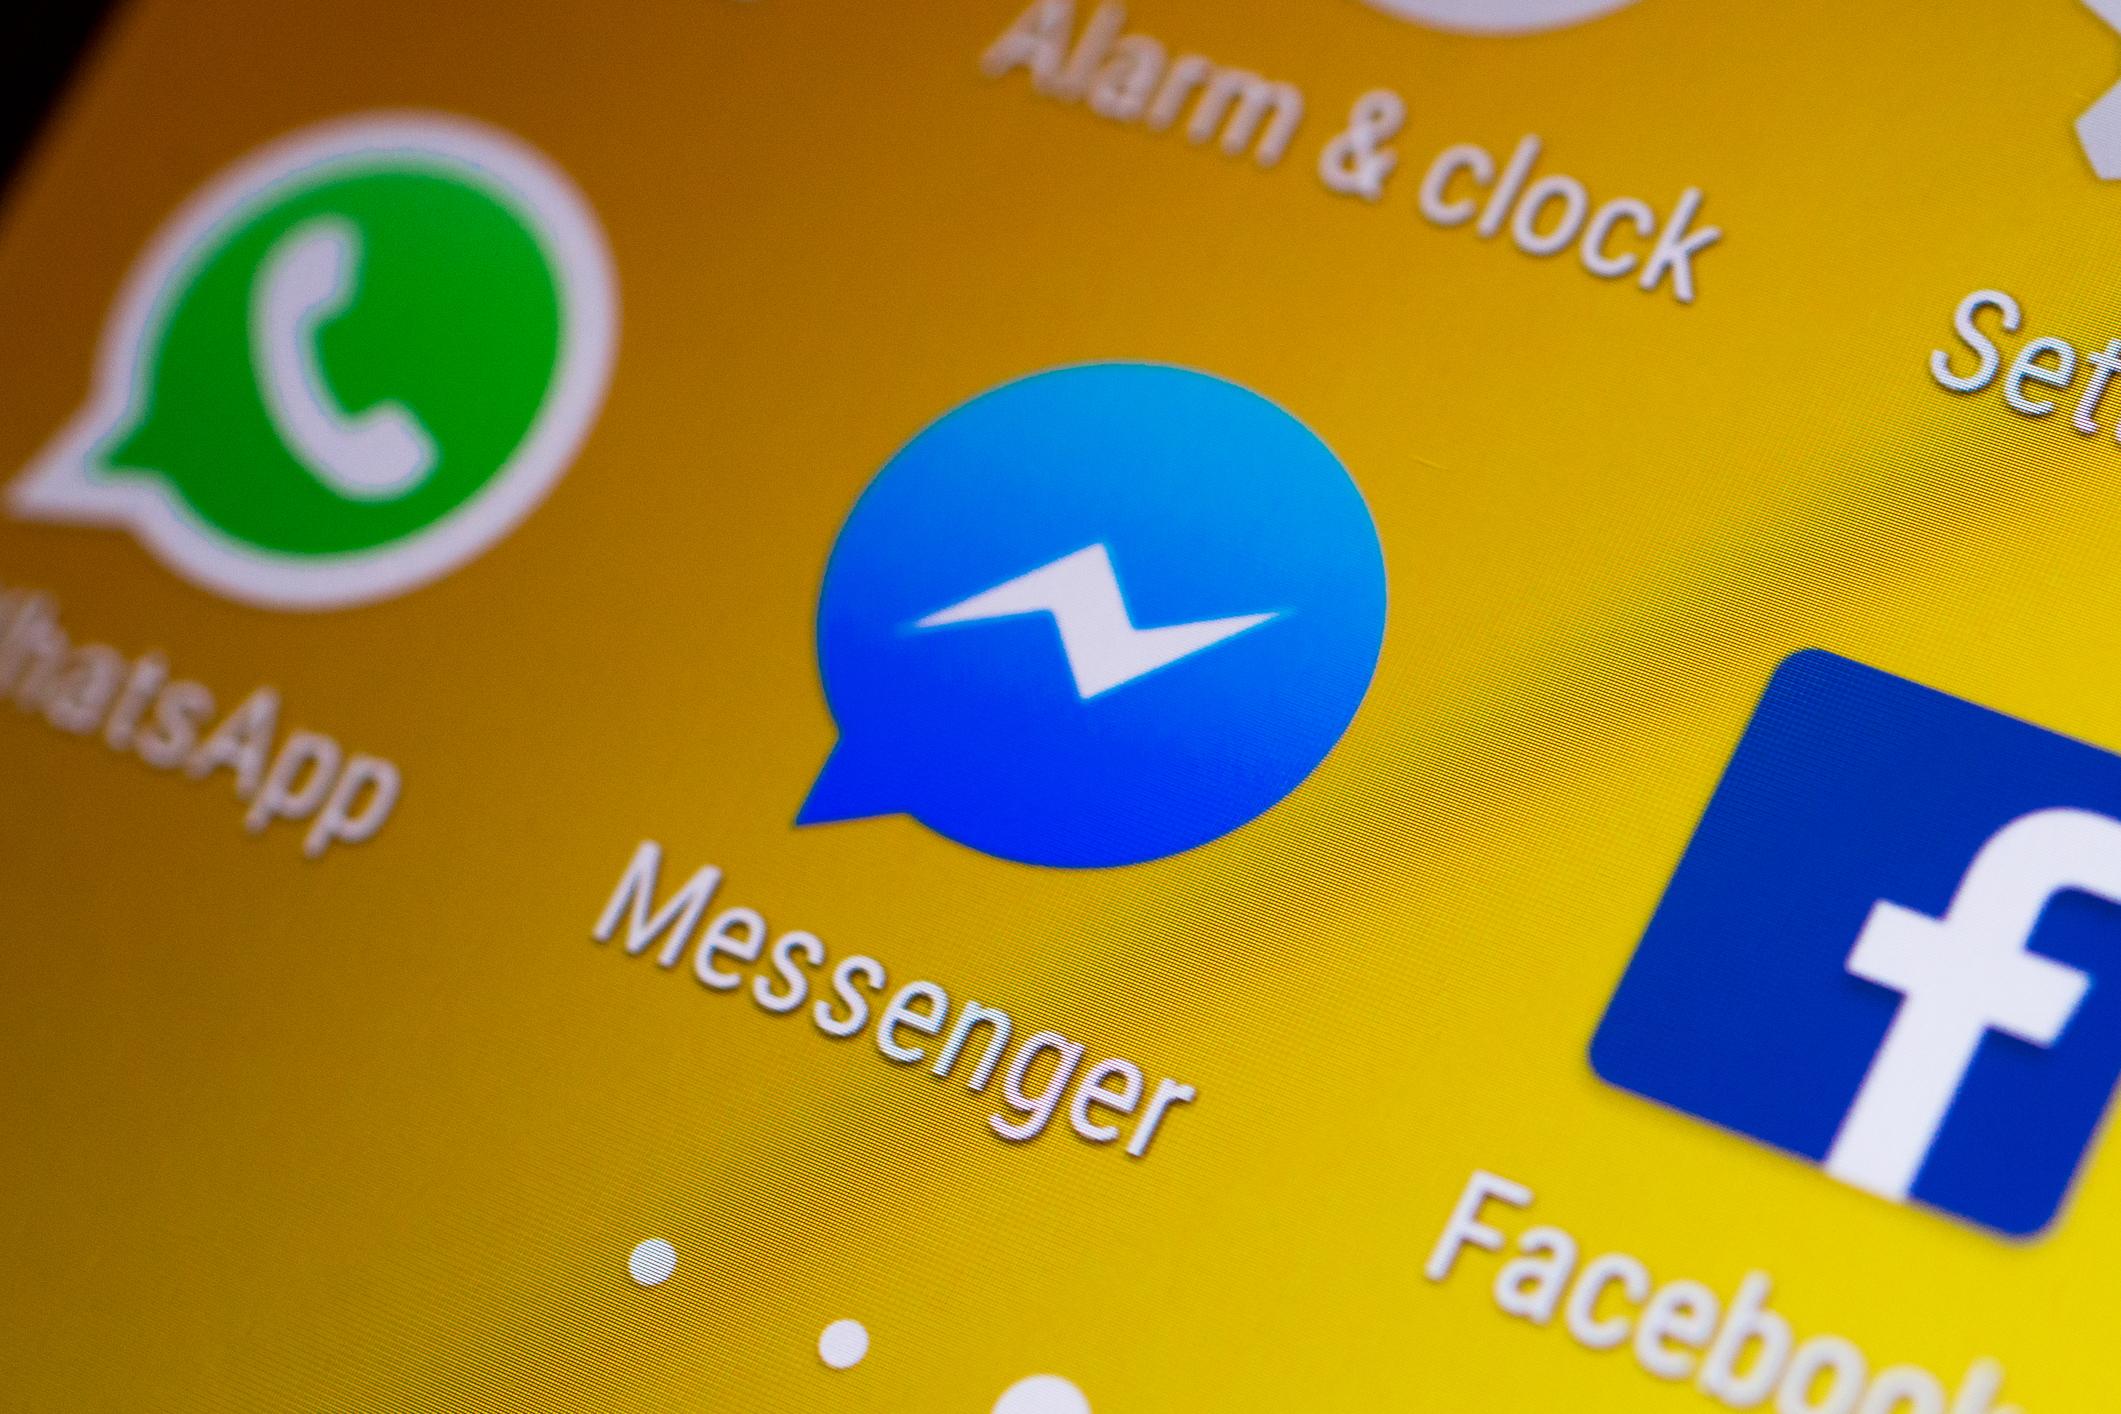 Facebook will let you un-send messages